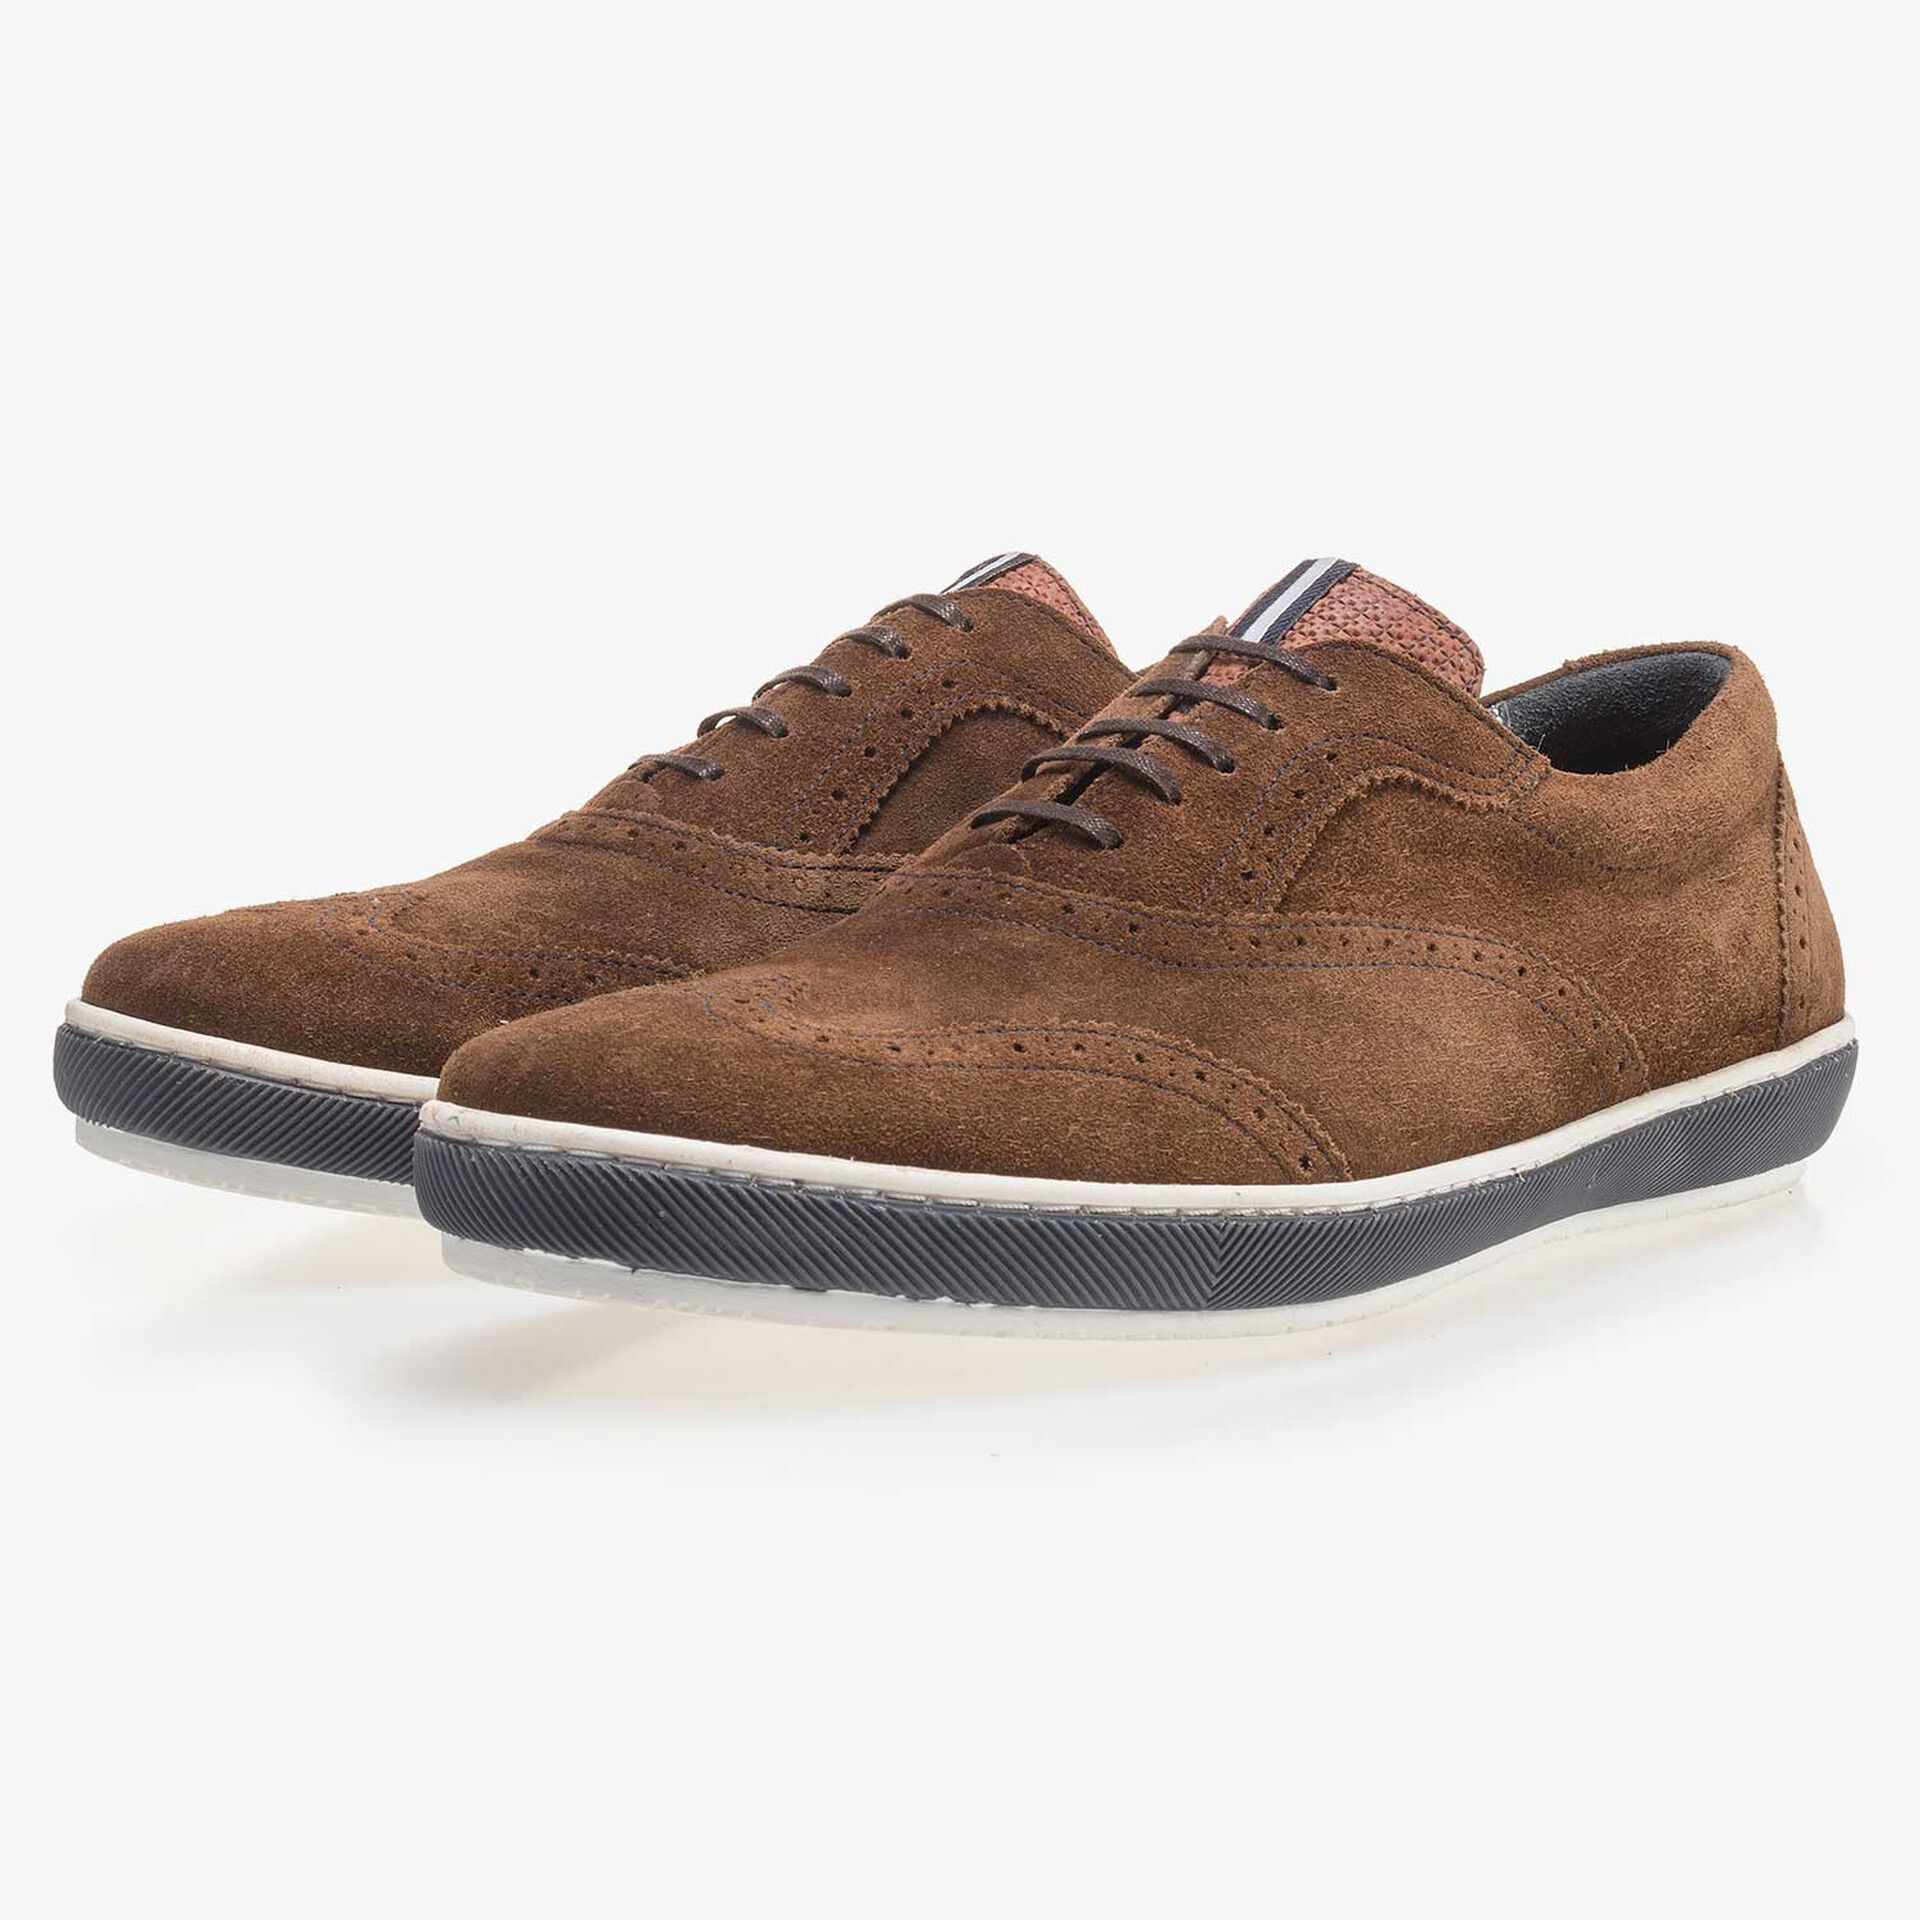 Brauner Brogue Wildleder Sneaker